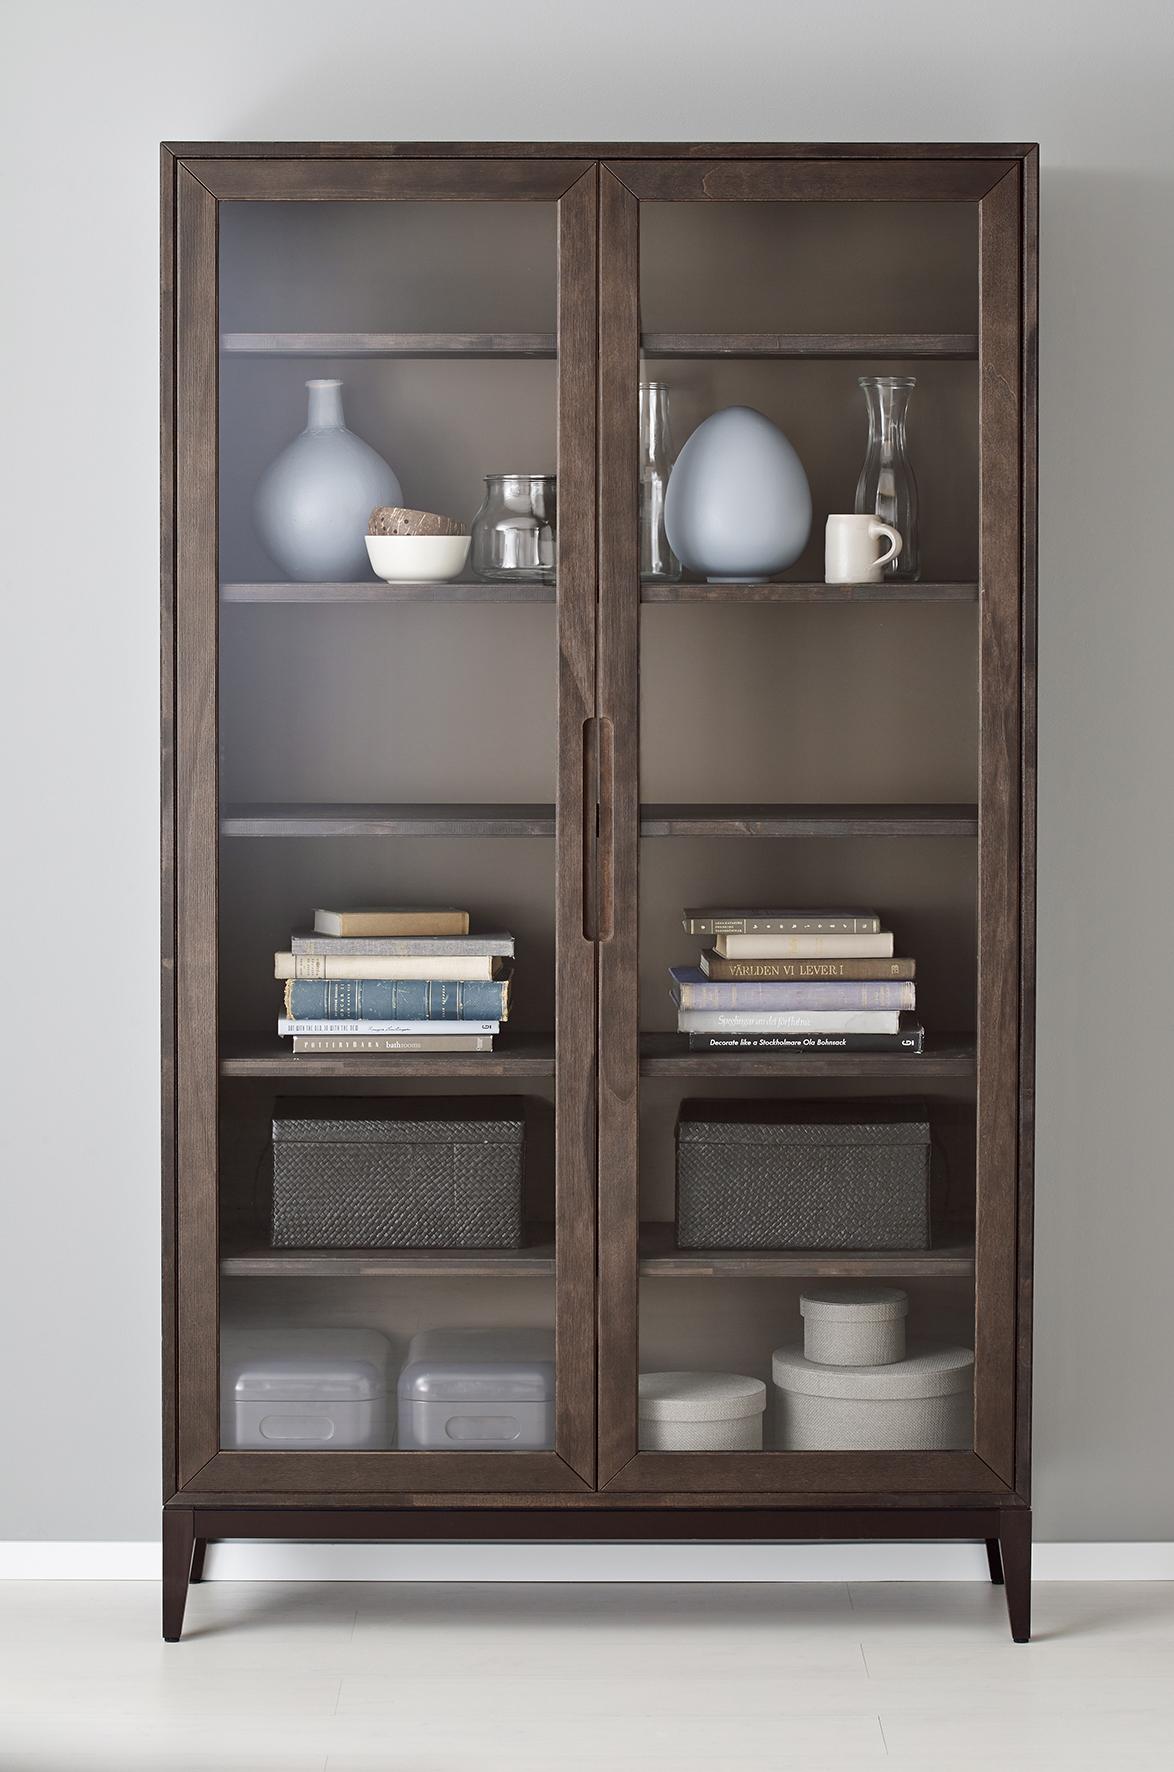 ikea meubels monteren zonder inbussleutel. Black Bedroom Furniture Sets. Home Design Ideas